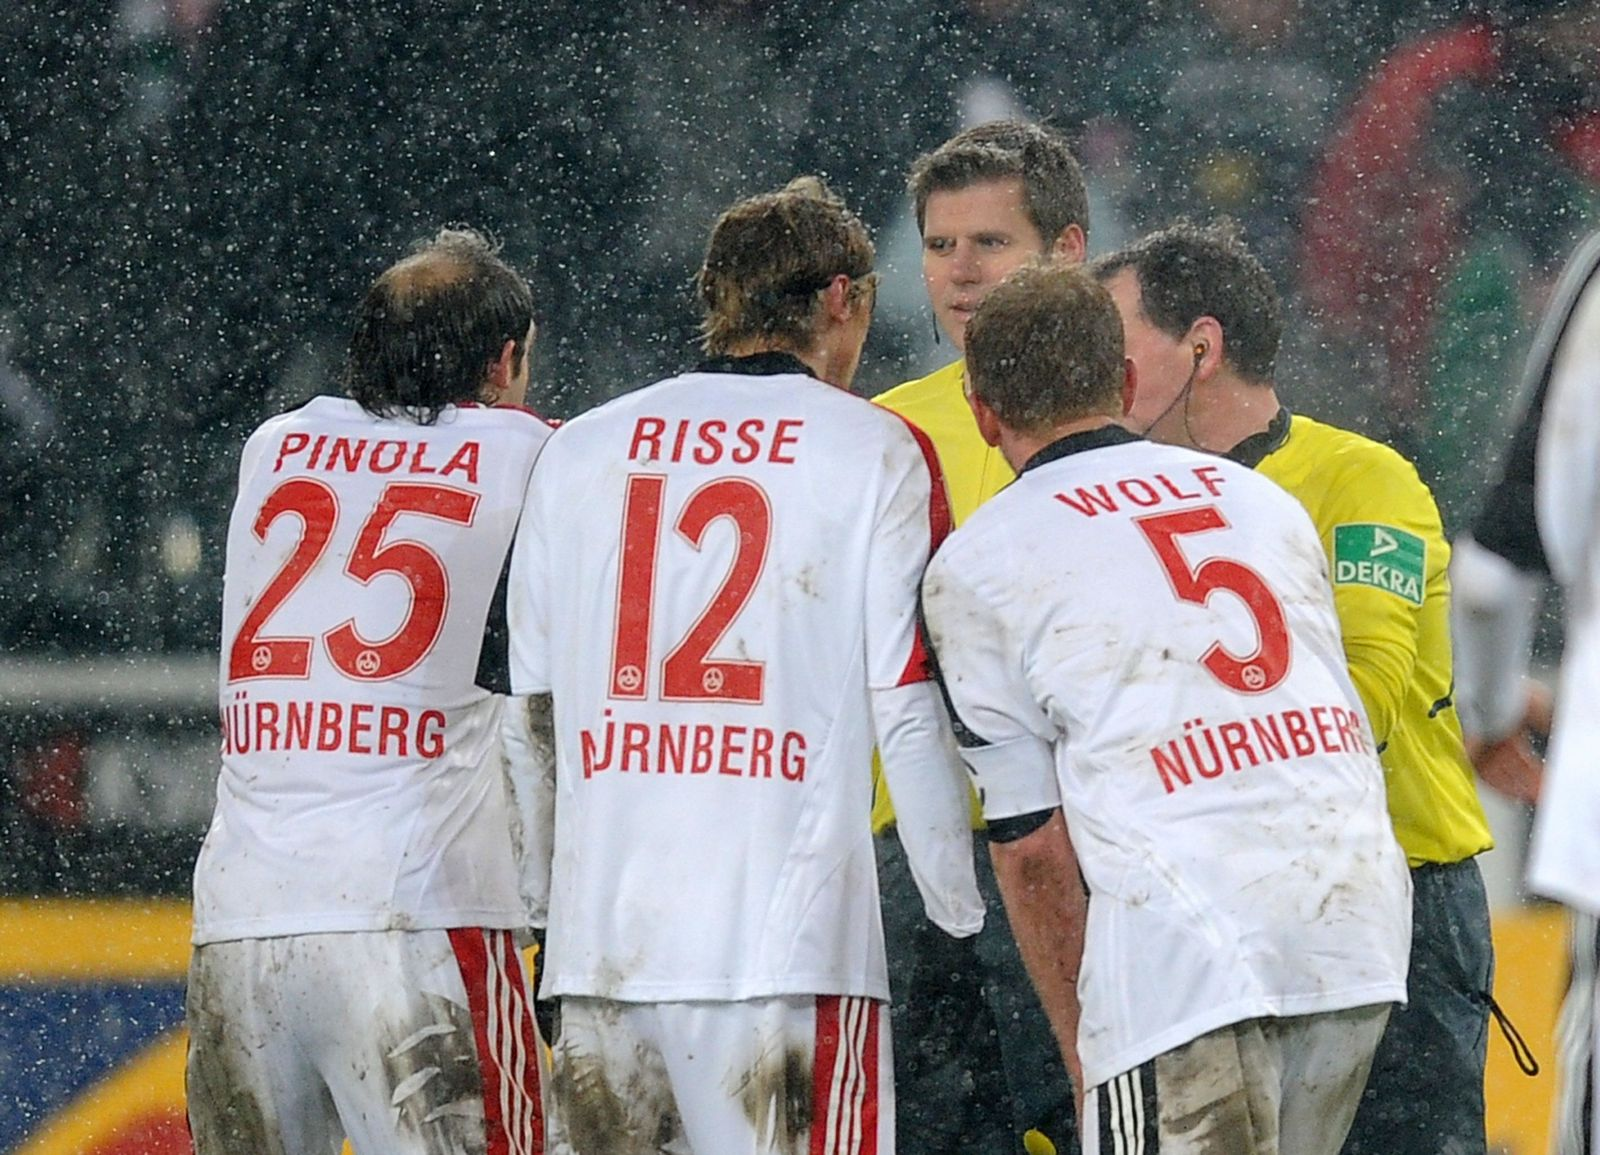 Borussia Mönchengladbach - 1.FC Nürnberg